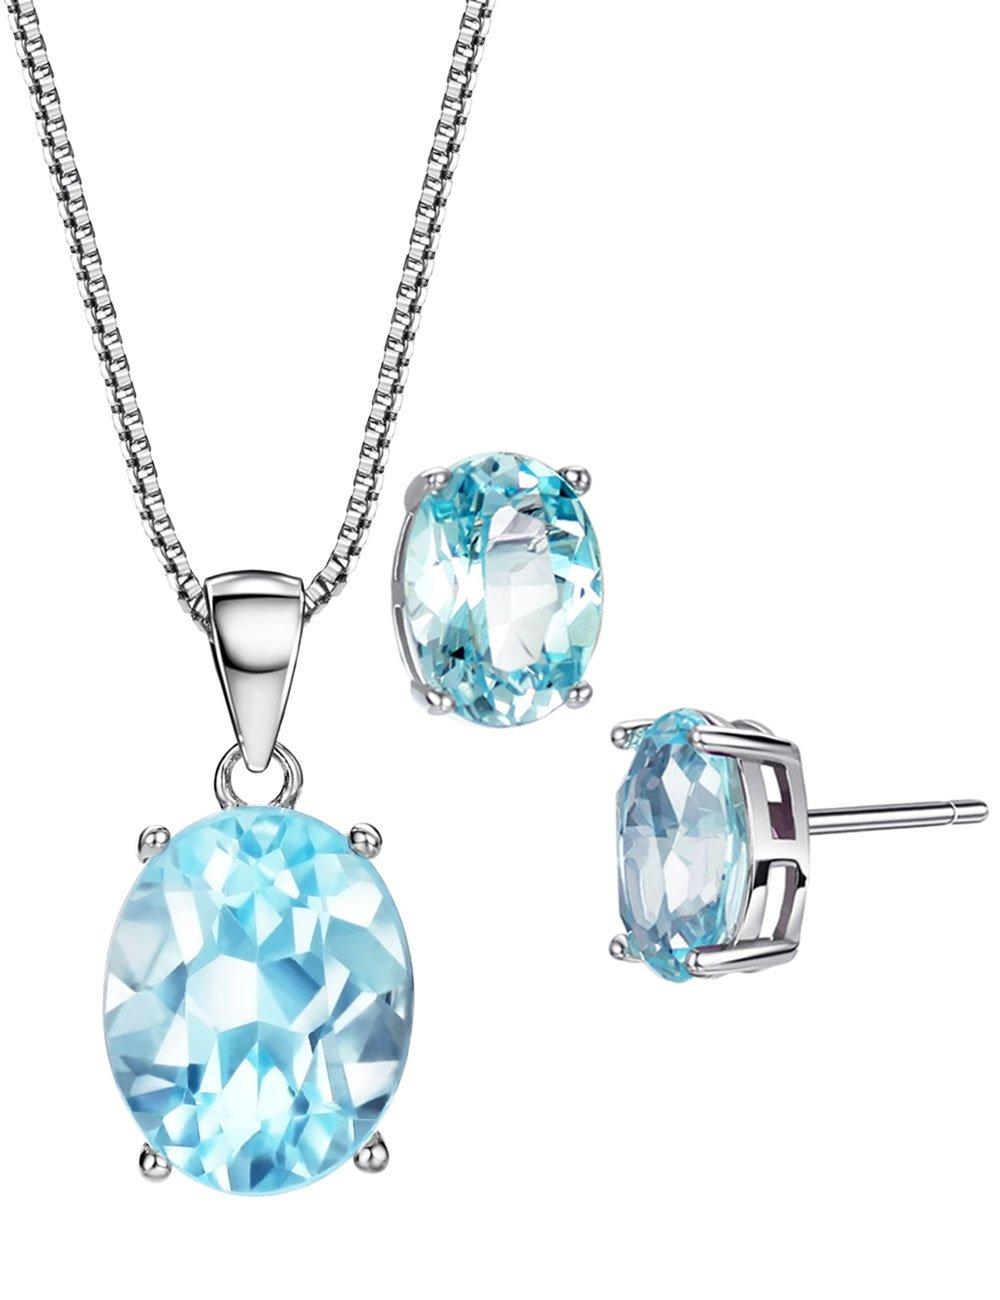 Topaz Jewelry Set Swiss Blue Sterling Silver 3.8 cttw November Birthstone Gemstone Fine Jewelry for Women